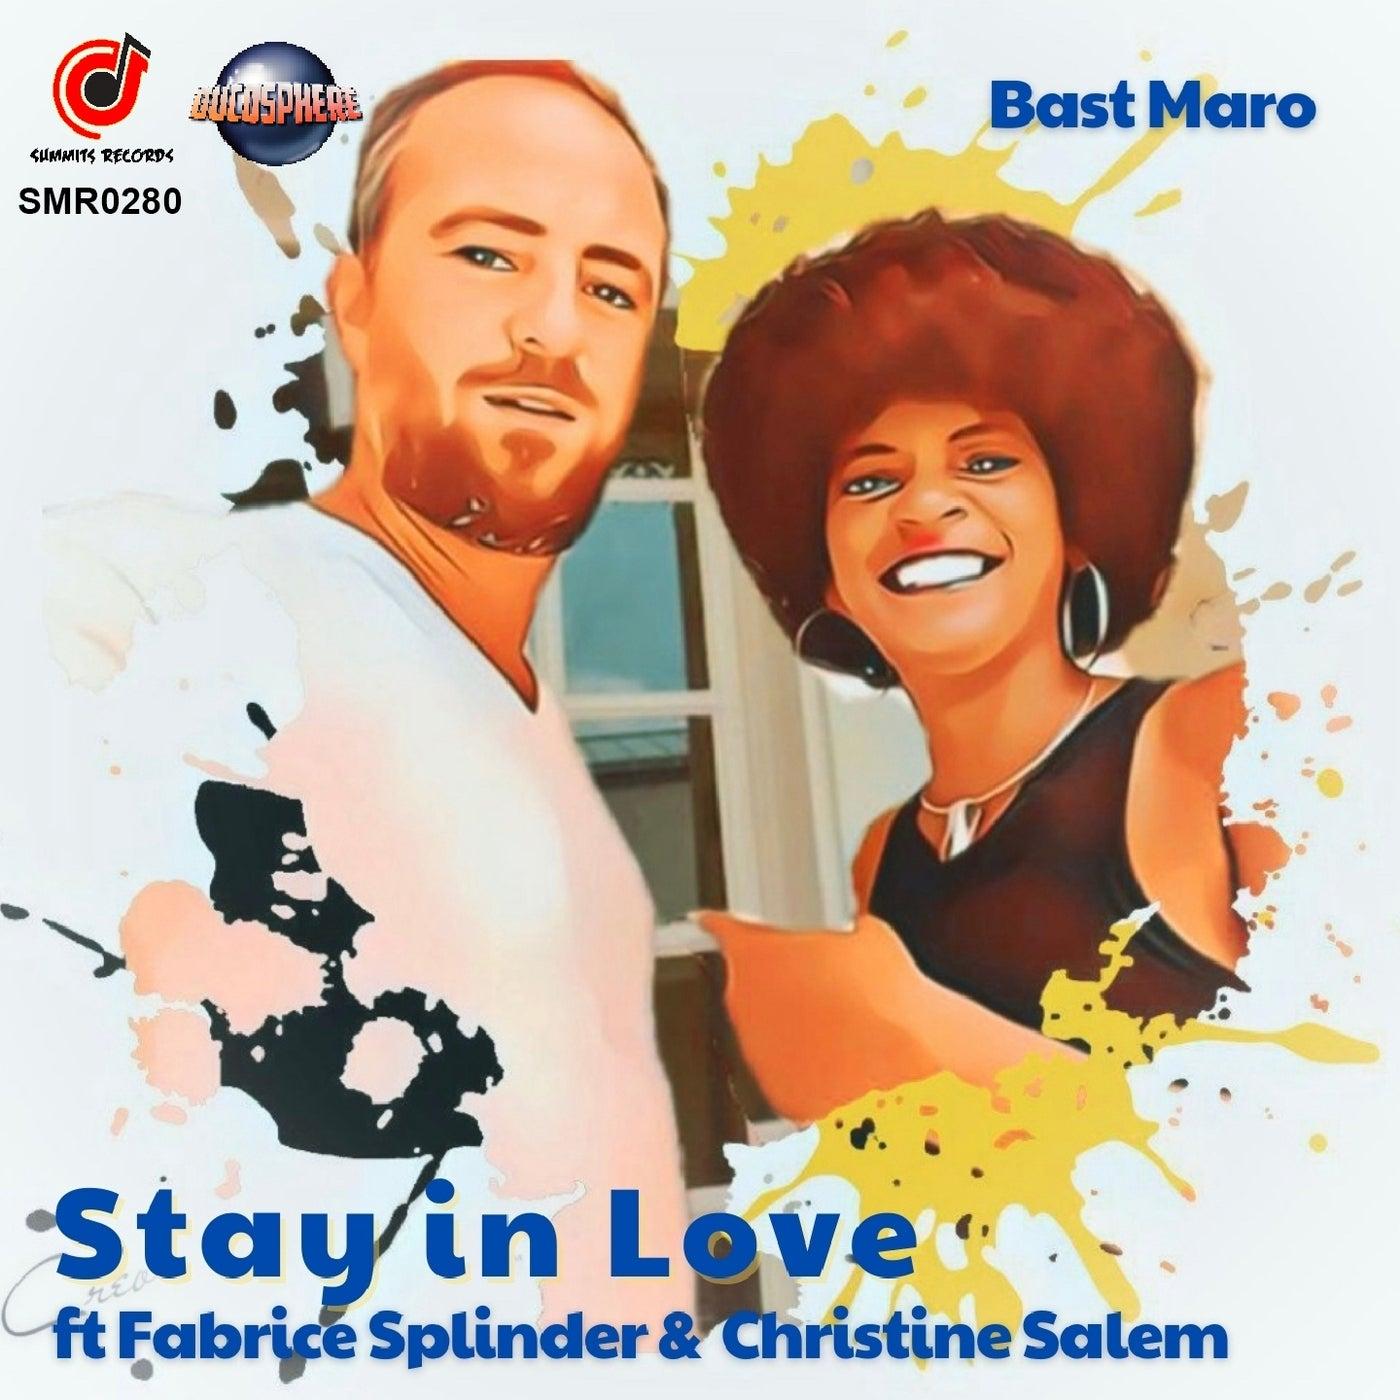 Stay in Love feat. Fabrice Splinder, Christine Salem (Radio Edit)